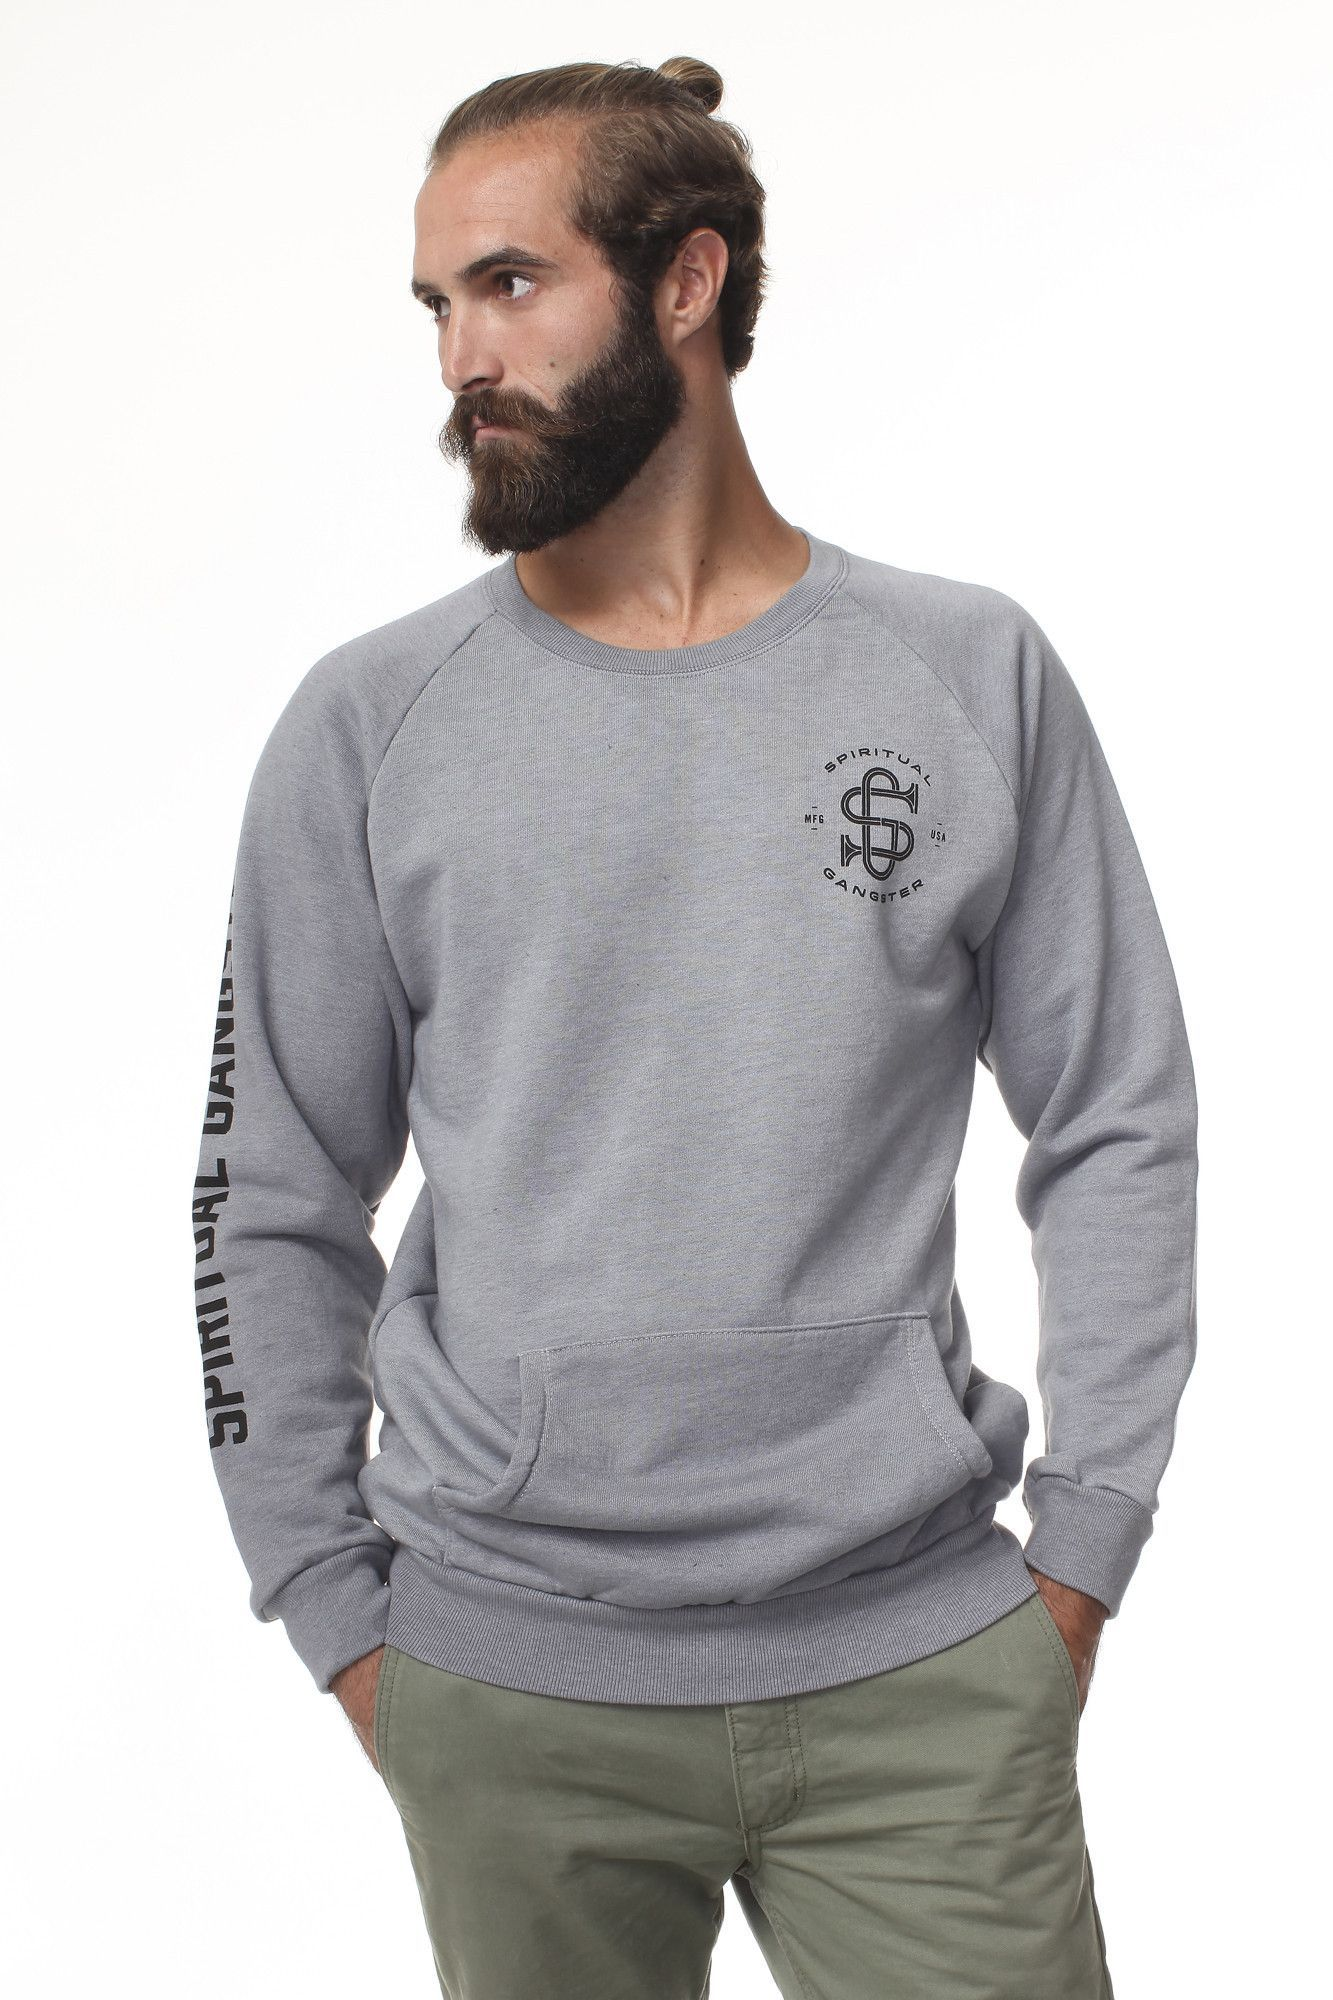 Gangster flannel shirts  Spiritual Gangster Crest Sweatshirt Grey  Products  Pinterest